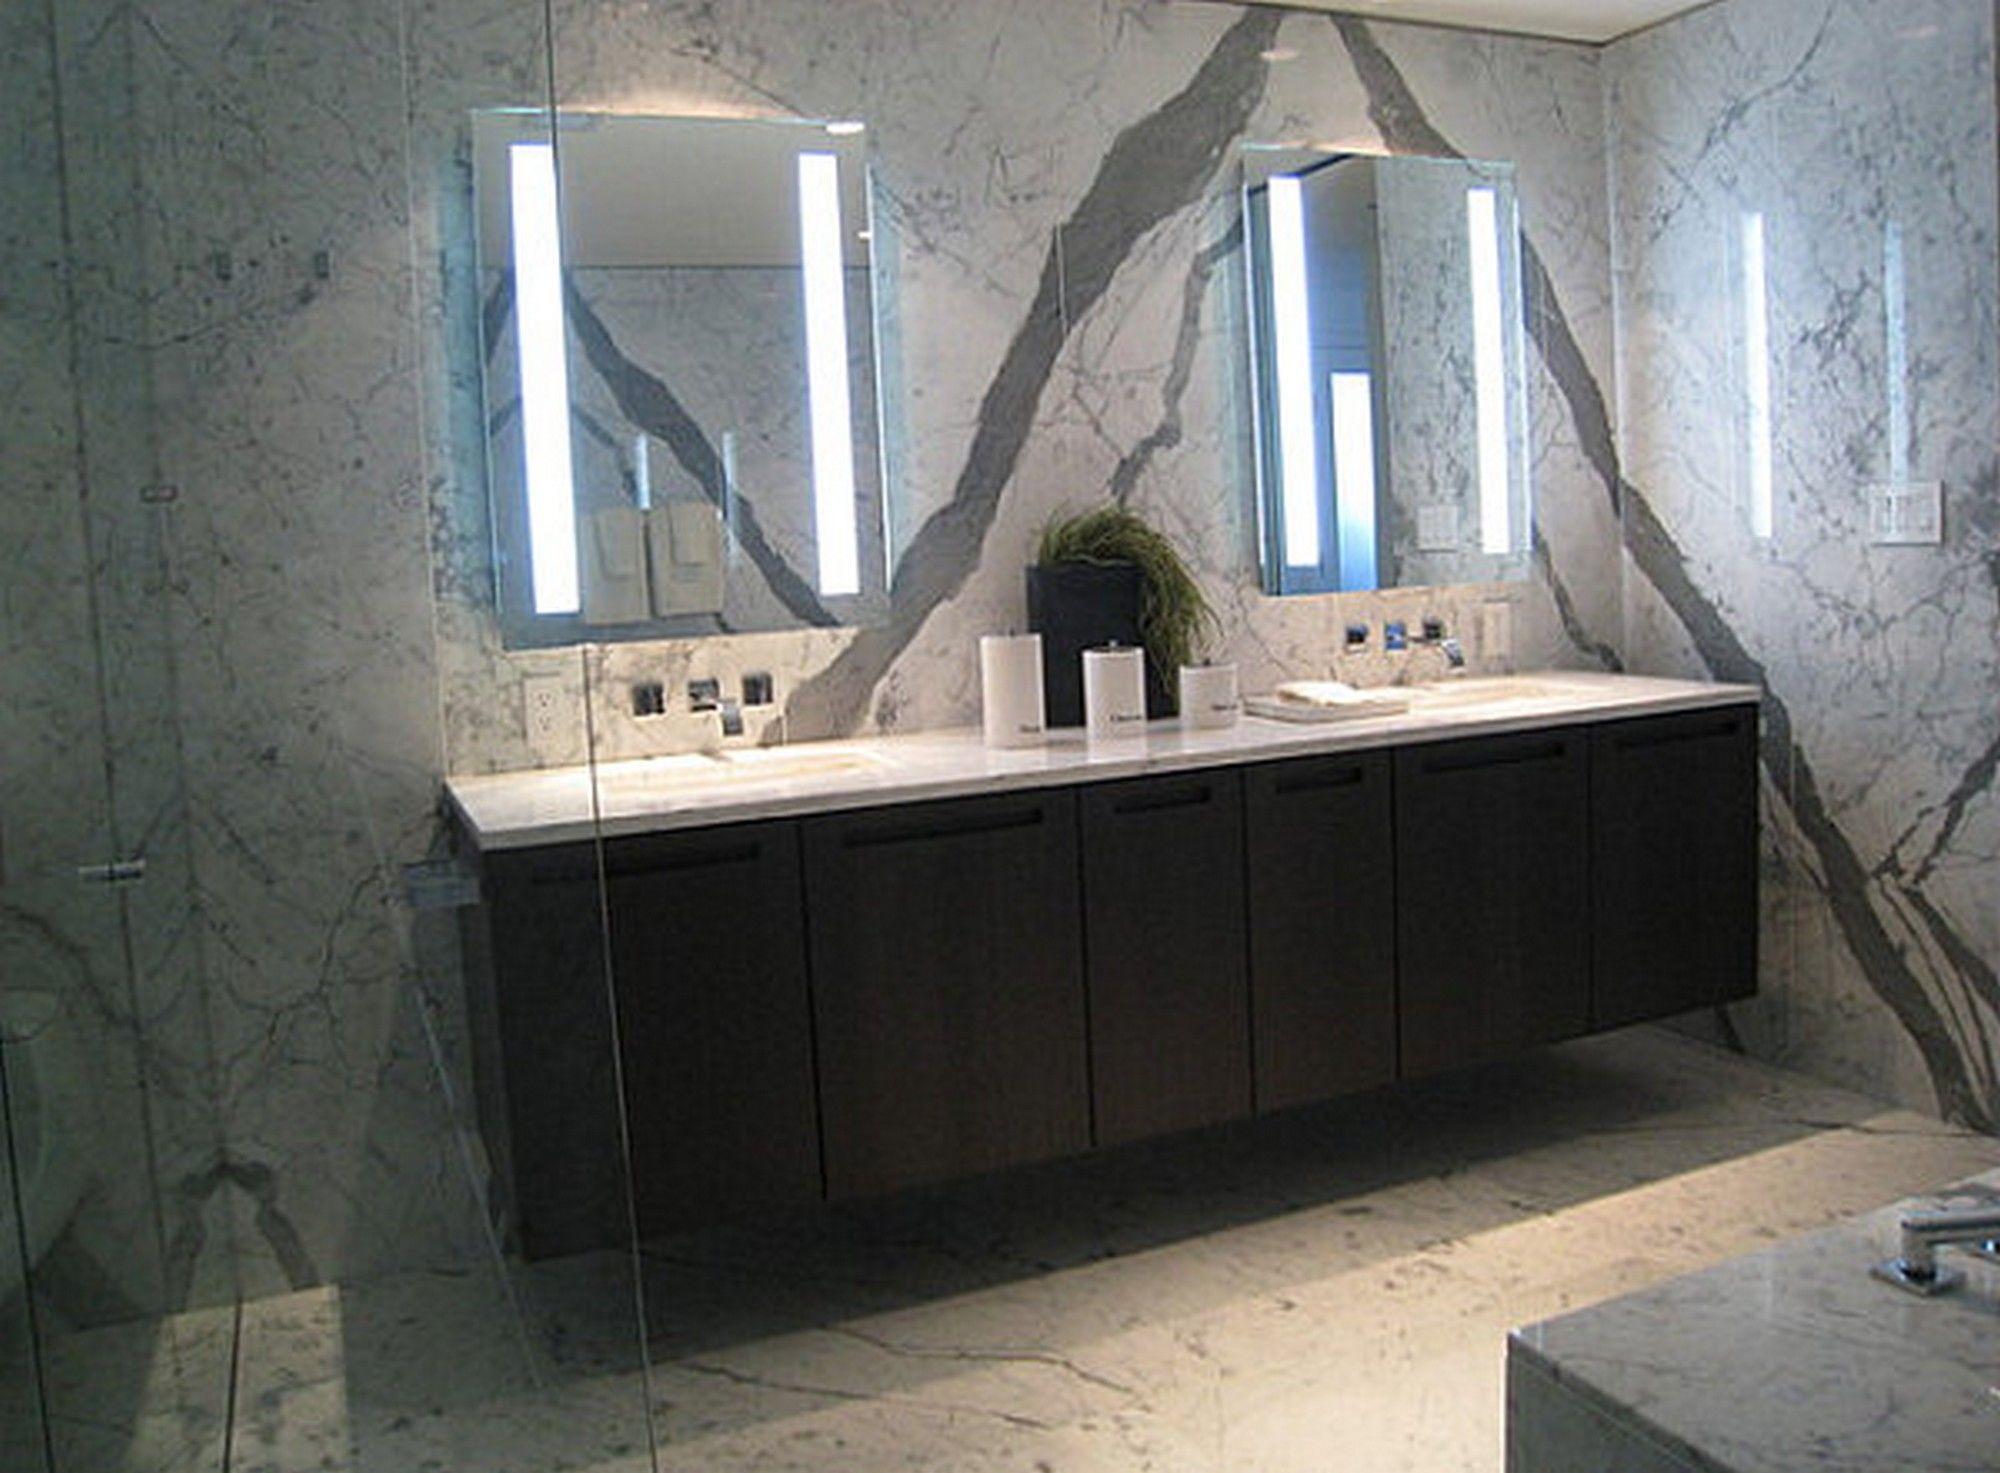 Amazing Build Your Own Bathroom Vanity Plans line Bathroom